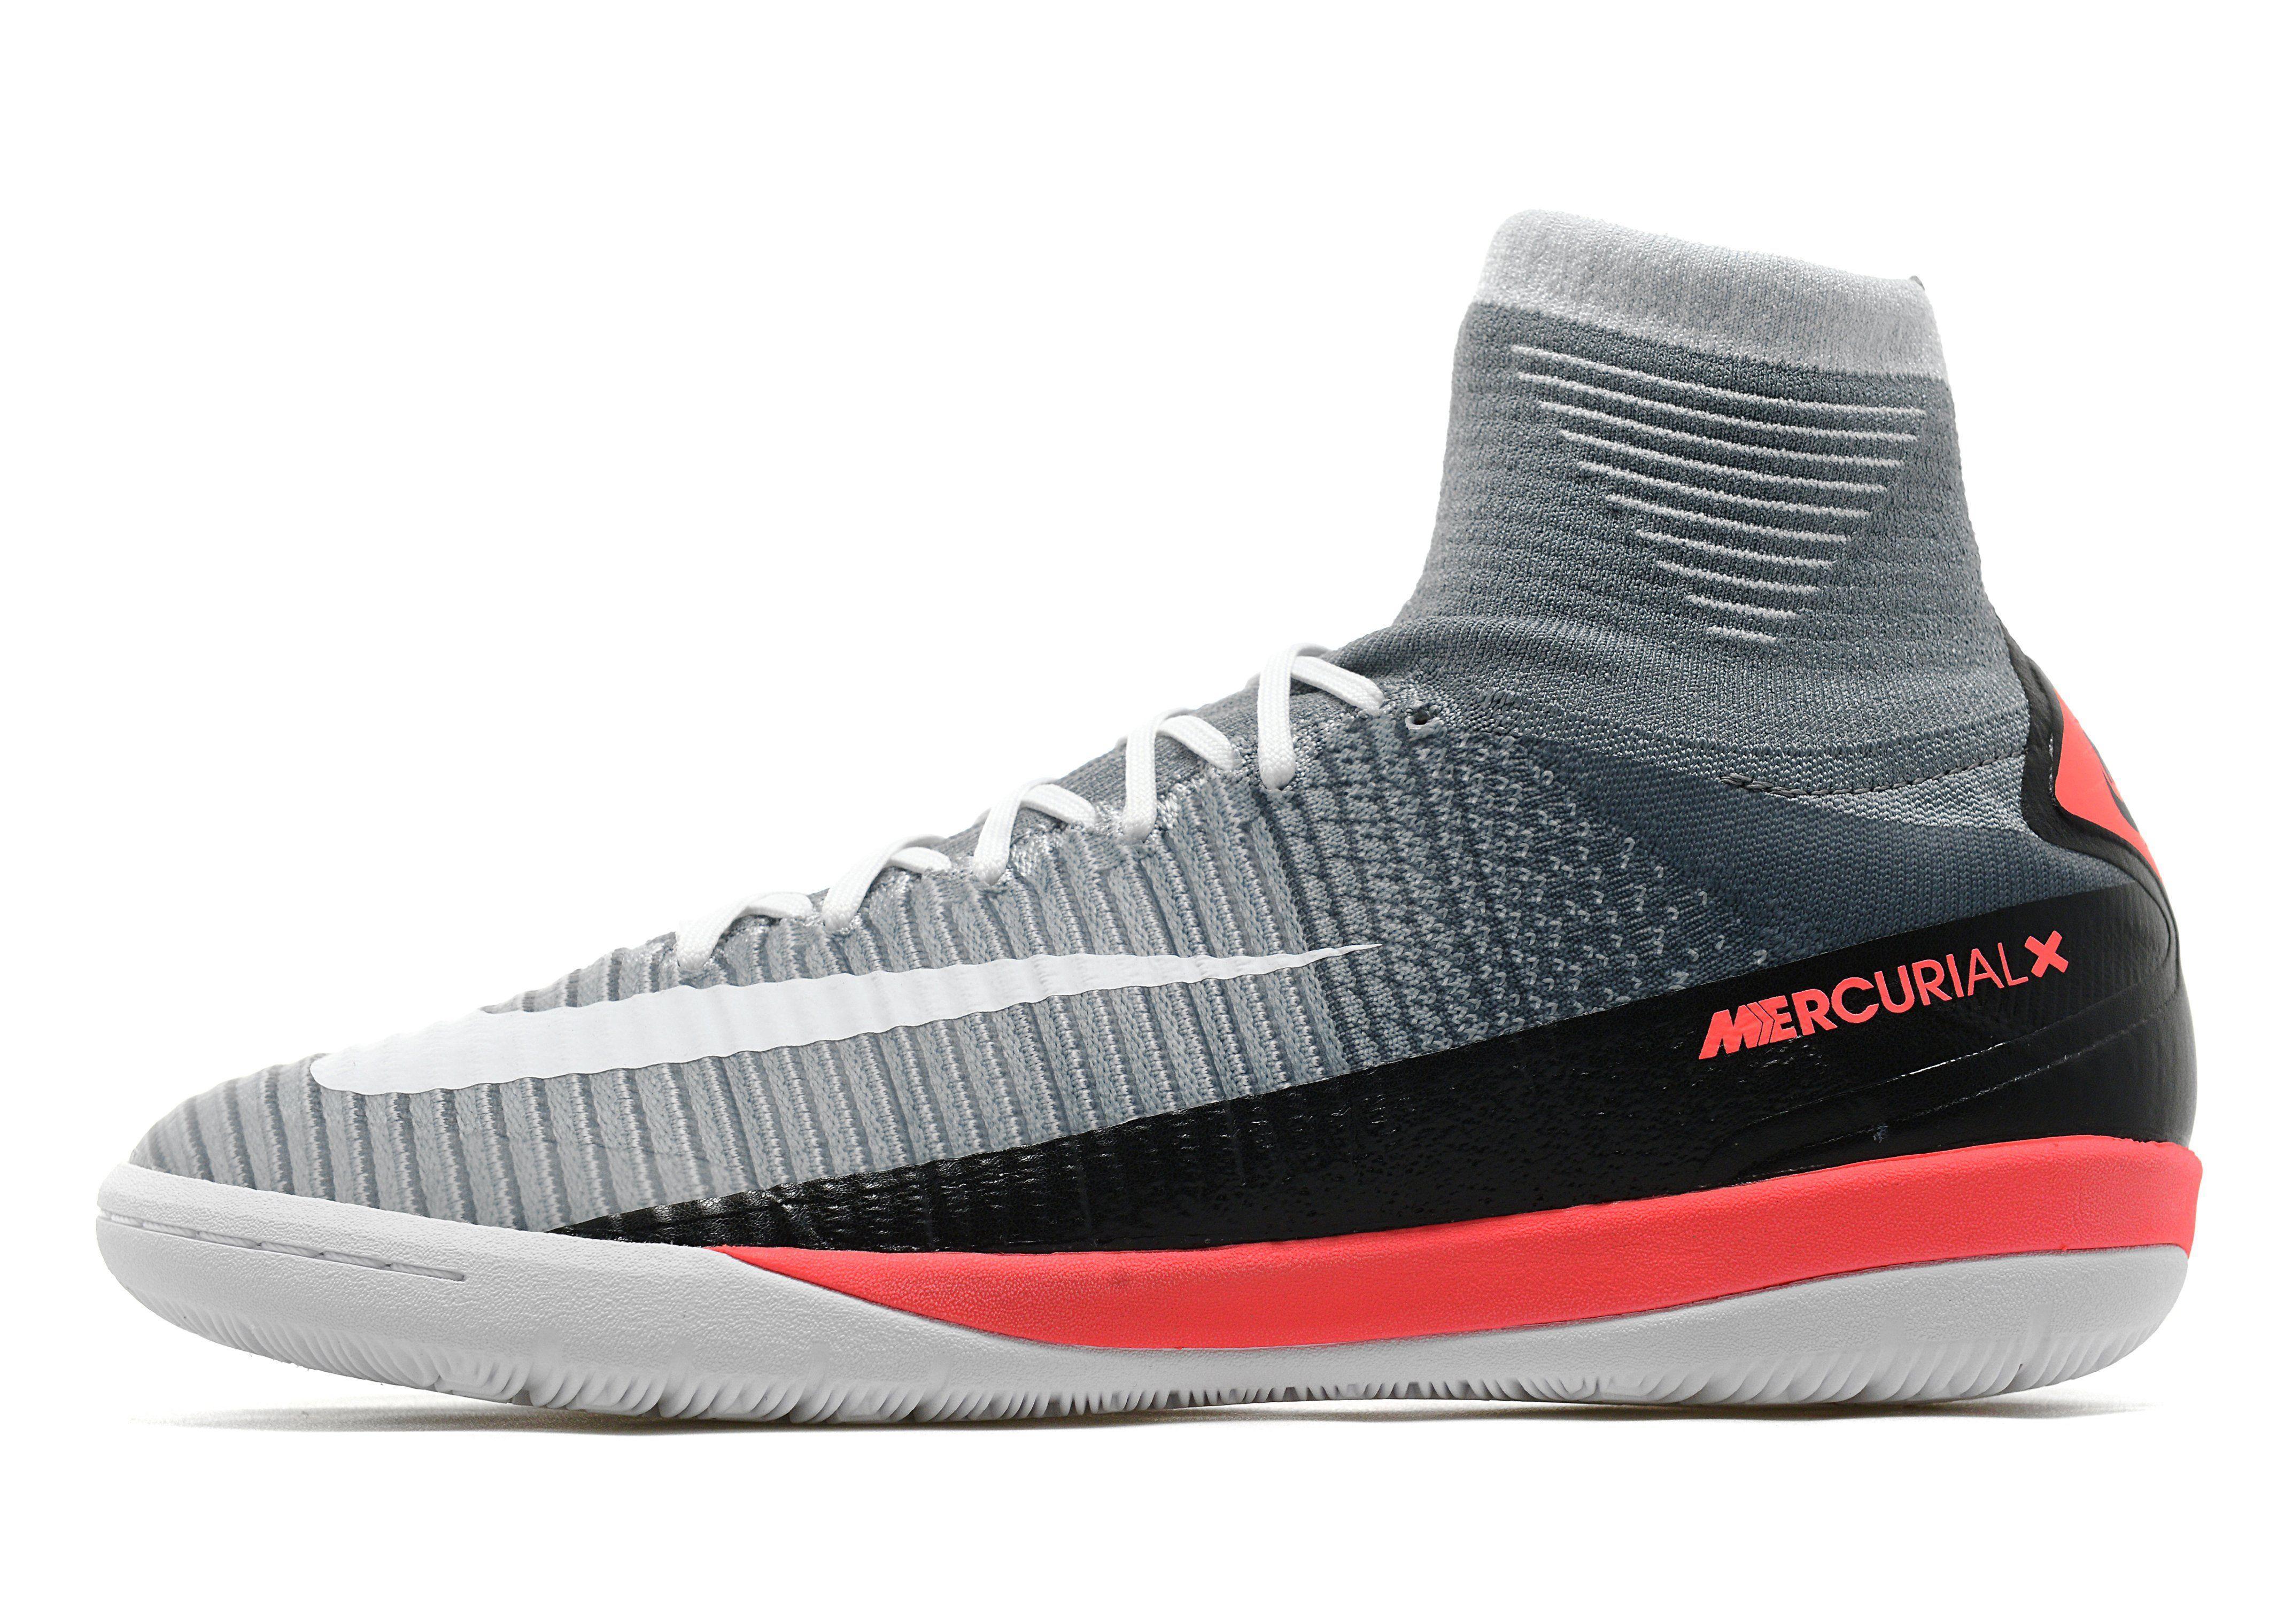 Nike MercurialX Proximo II IC Indoor/Court Football Shoe Grey FI8138492